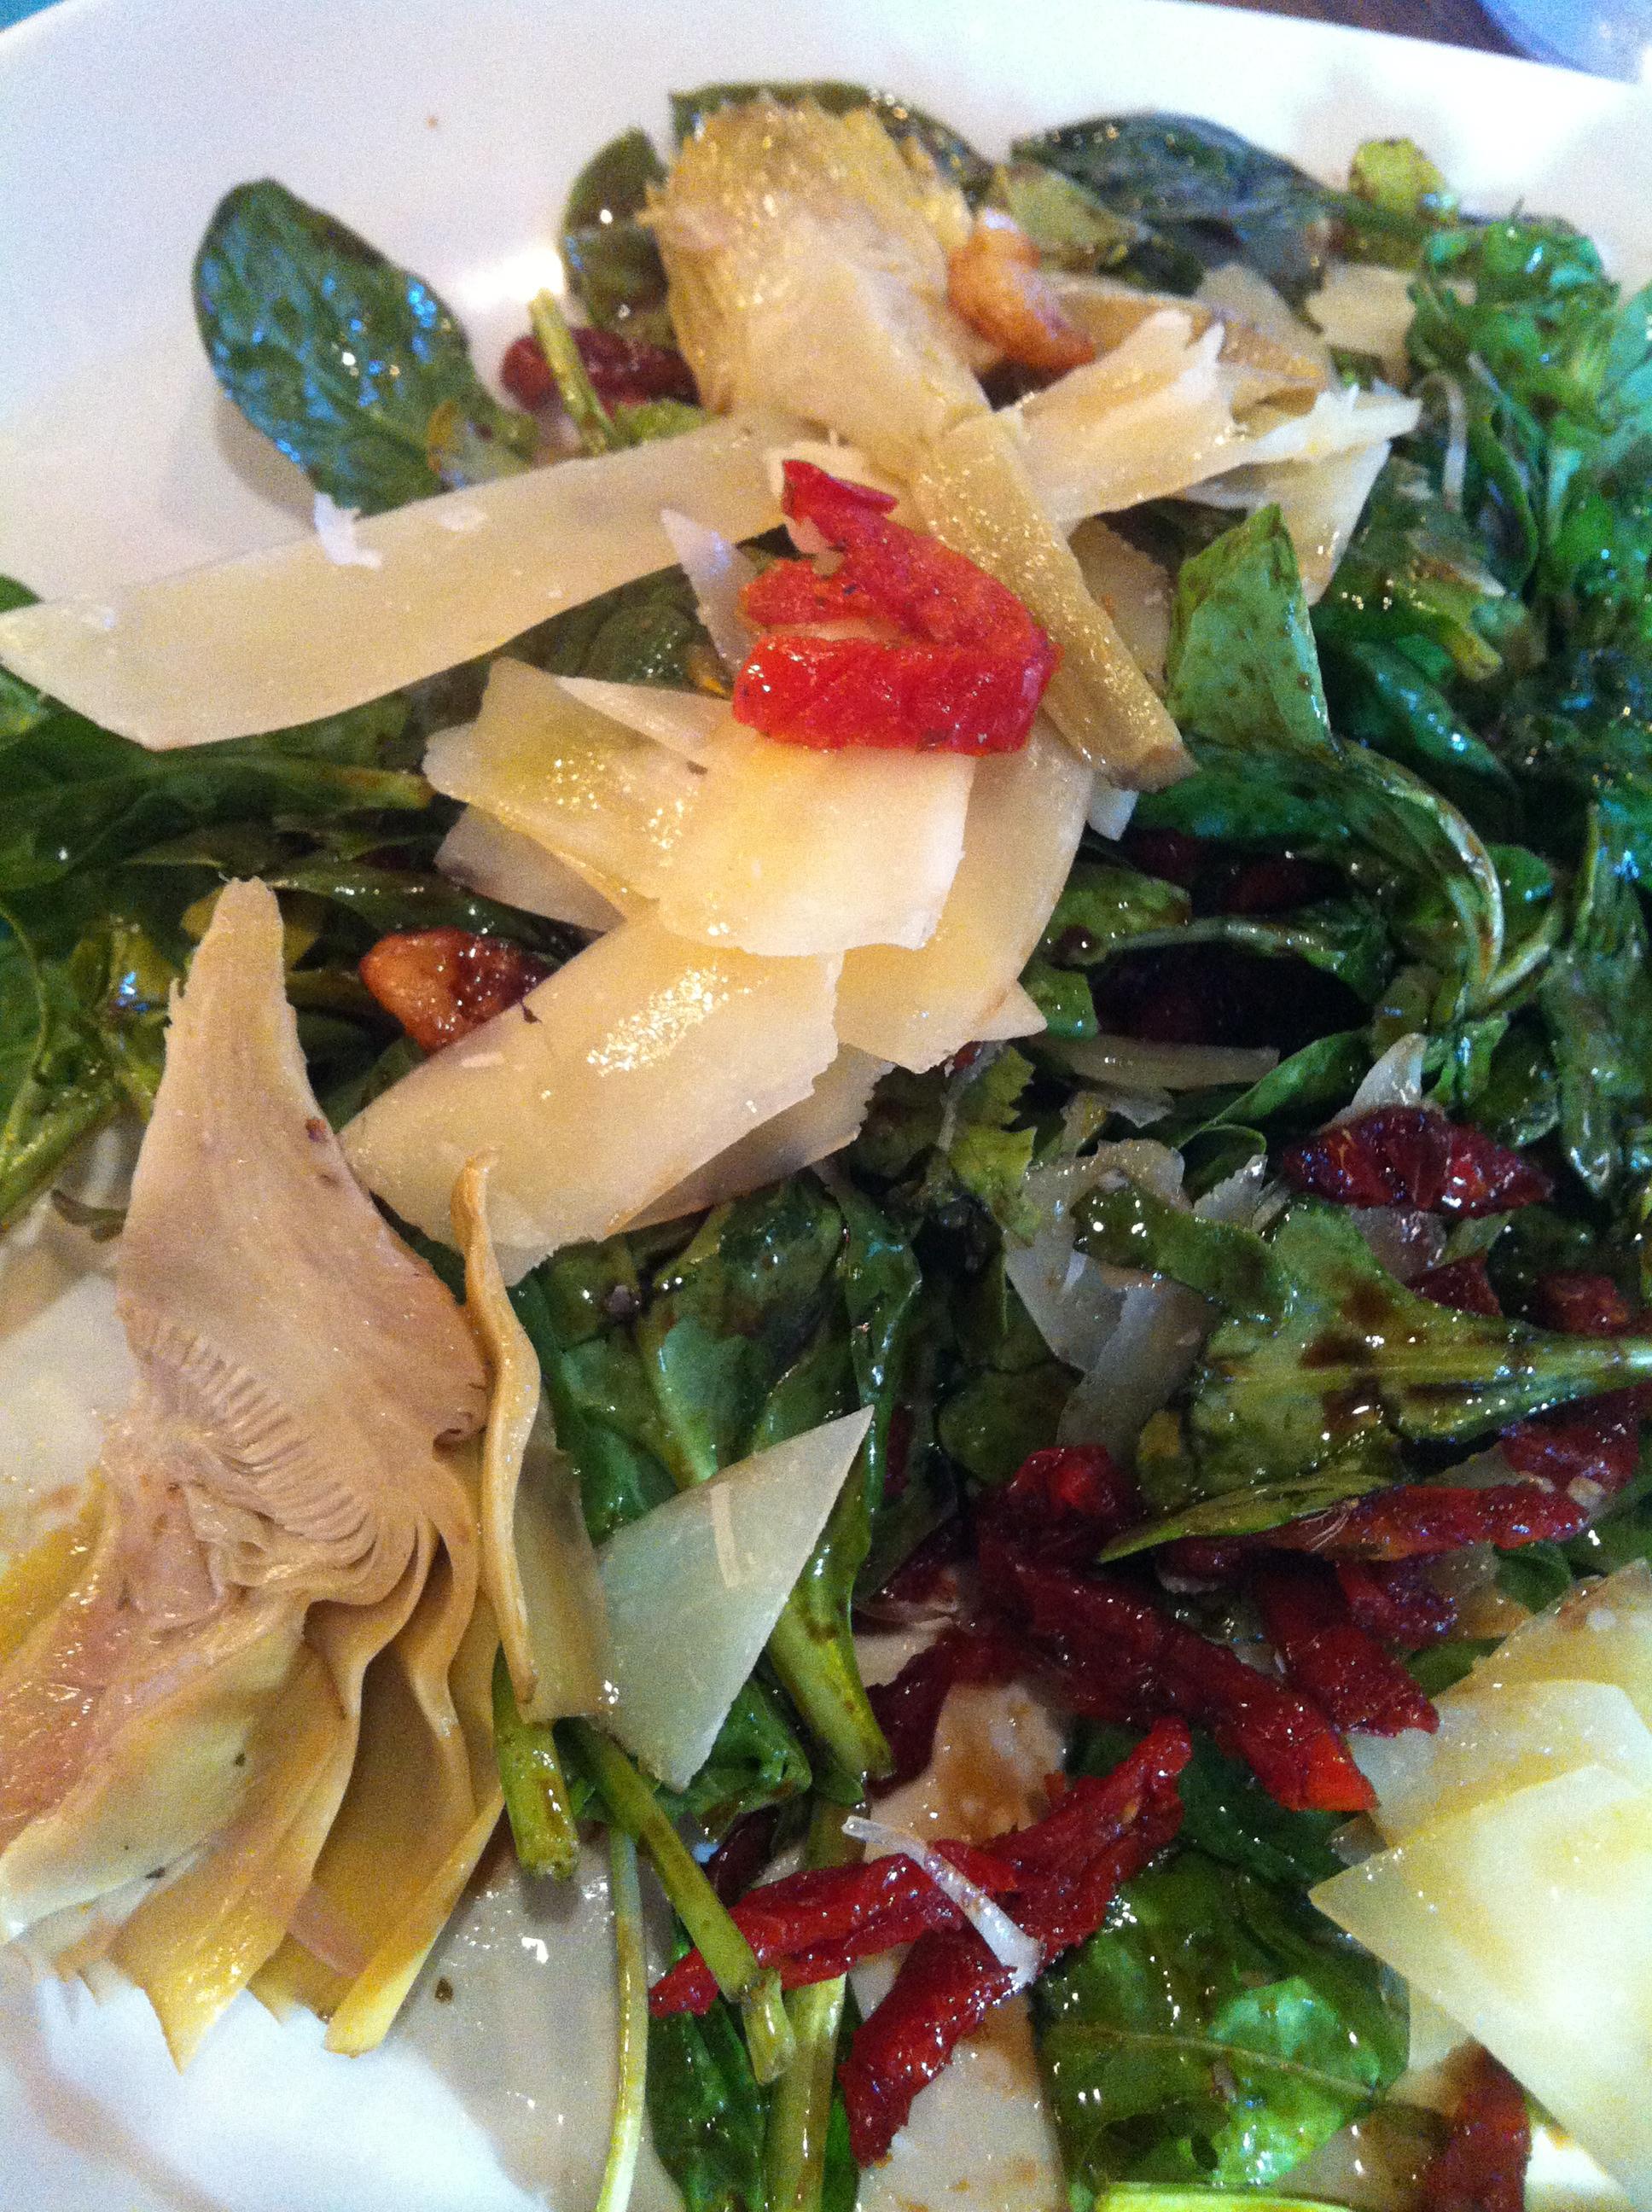 Delightful dinner salad. Fries eaten but not pictured.